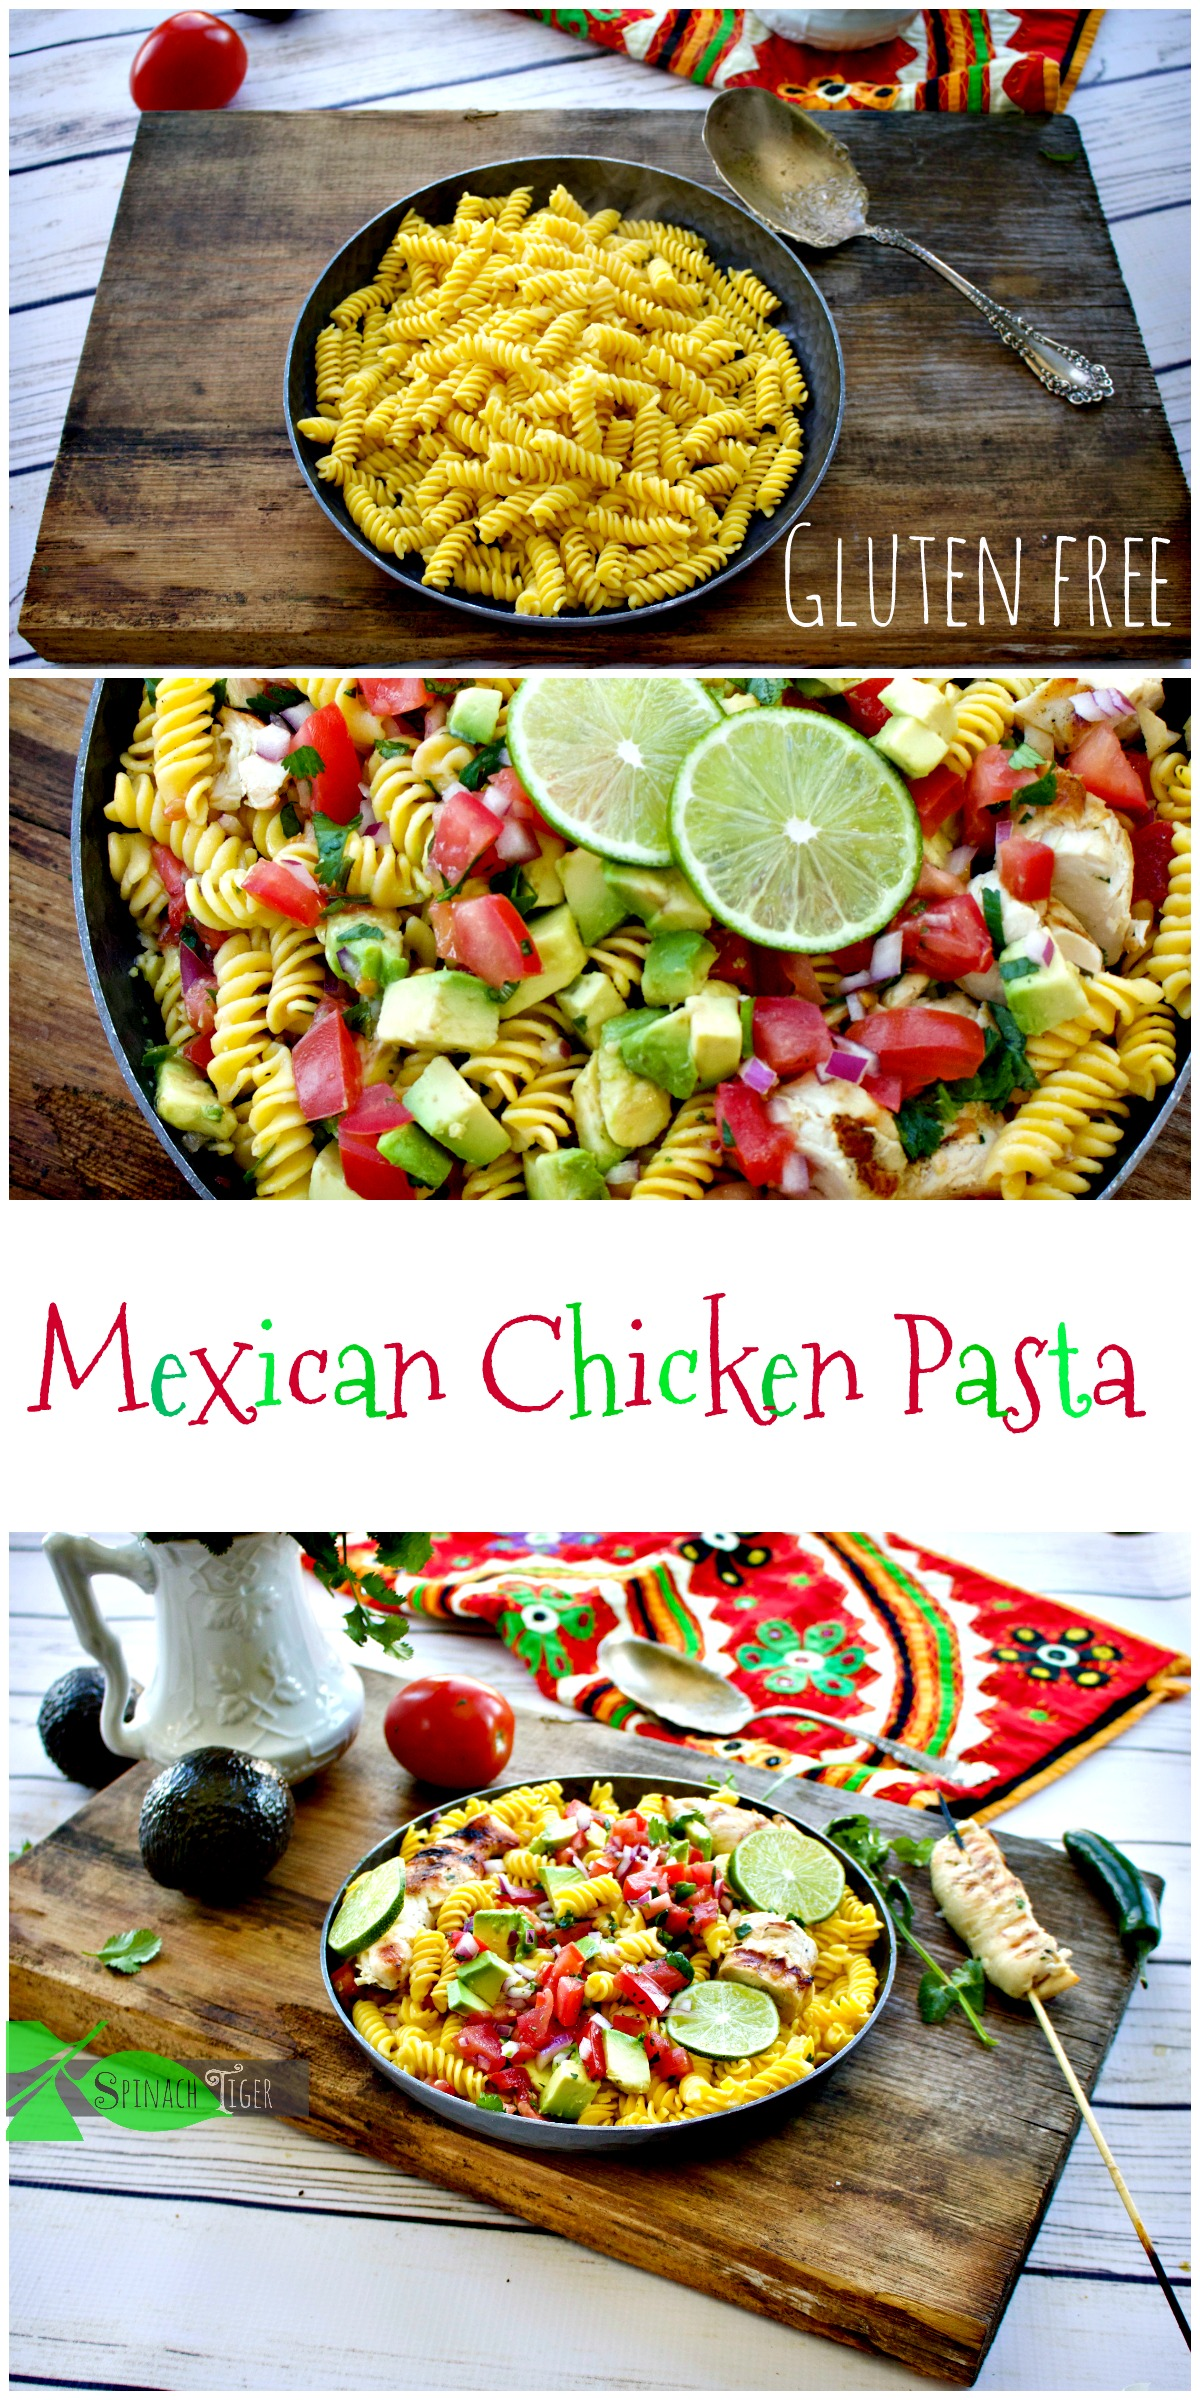 Make Gluten Free Mexican Chicken Pasta from Spinach Tiger